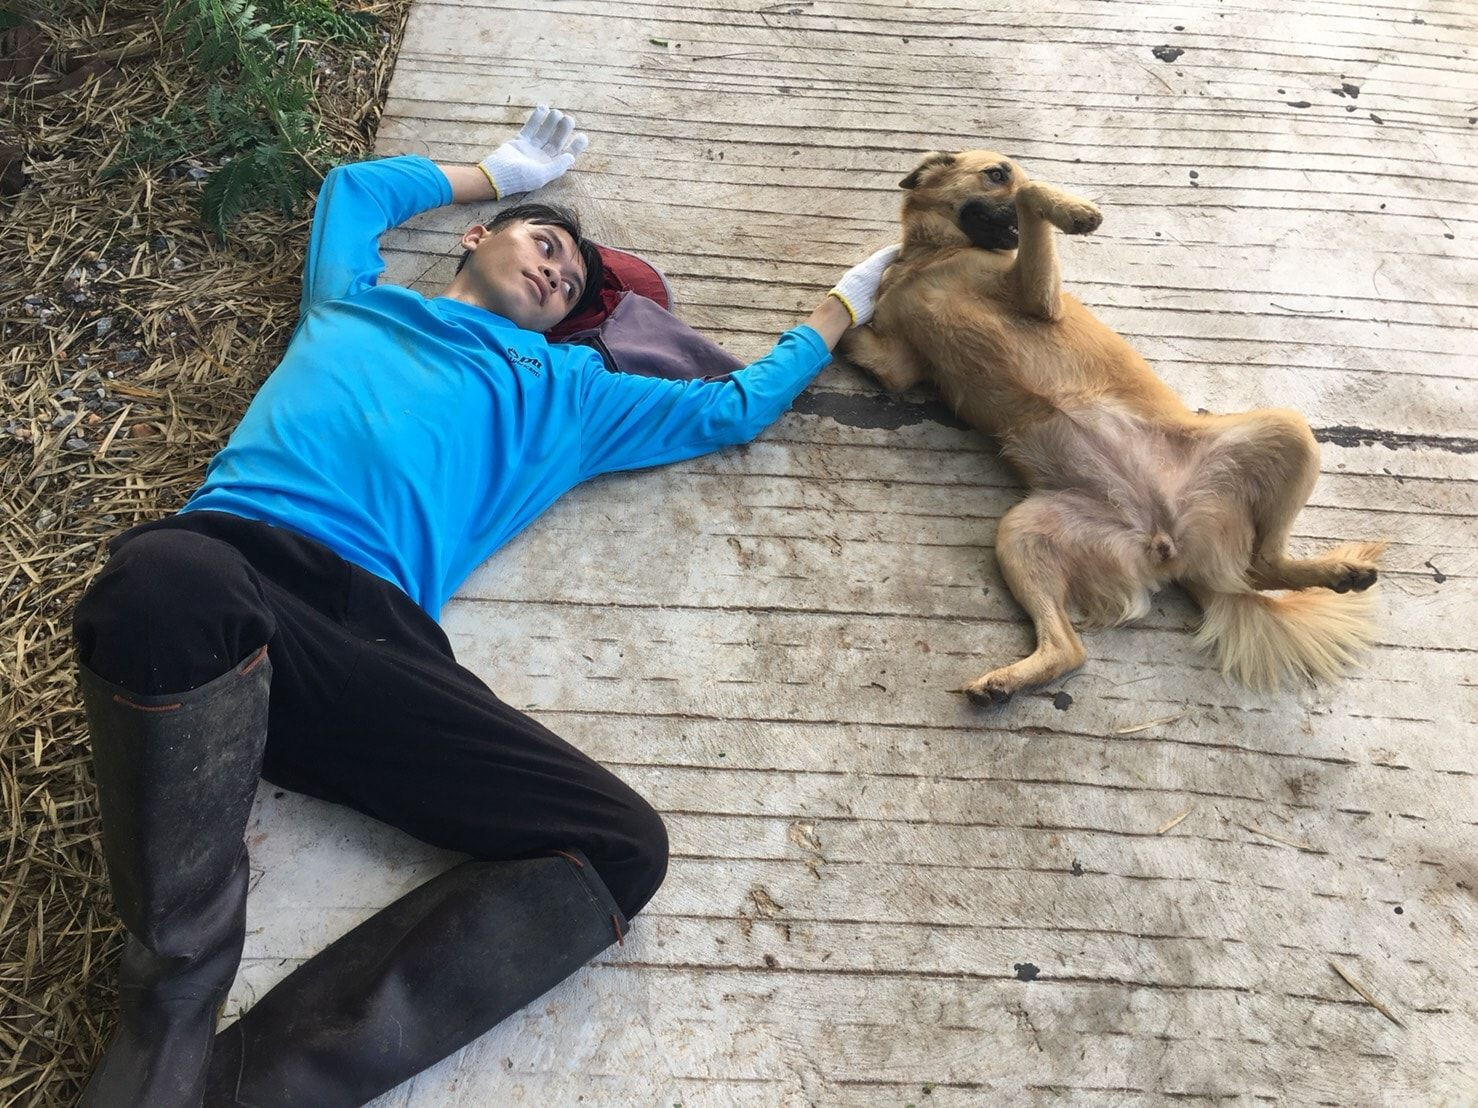 Dogilike.com :: โหดเกินคน ... ชายฟันหมาจมูกเกือบขาด เหตุแค่เพราะโดนหมาเห่าใส่